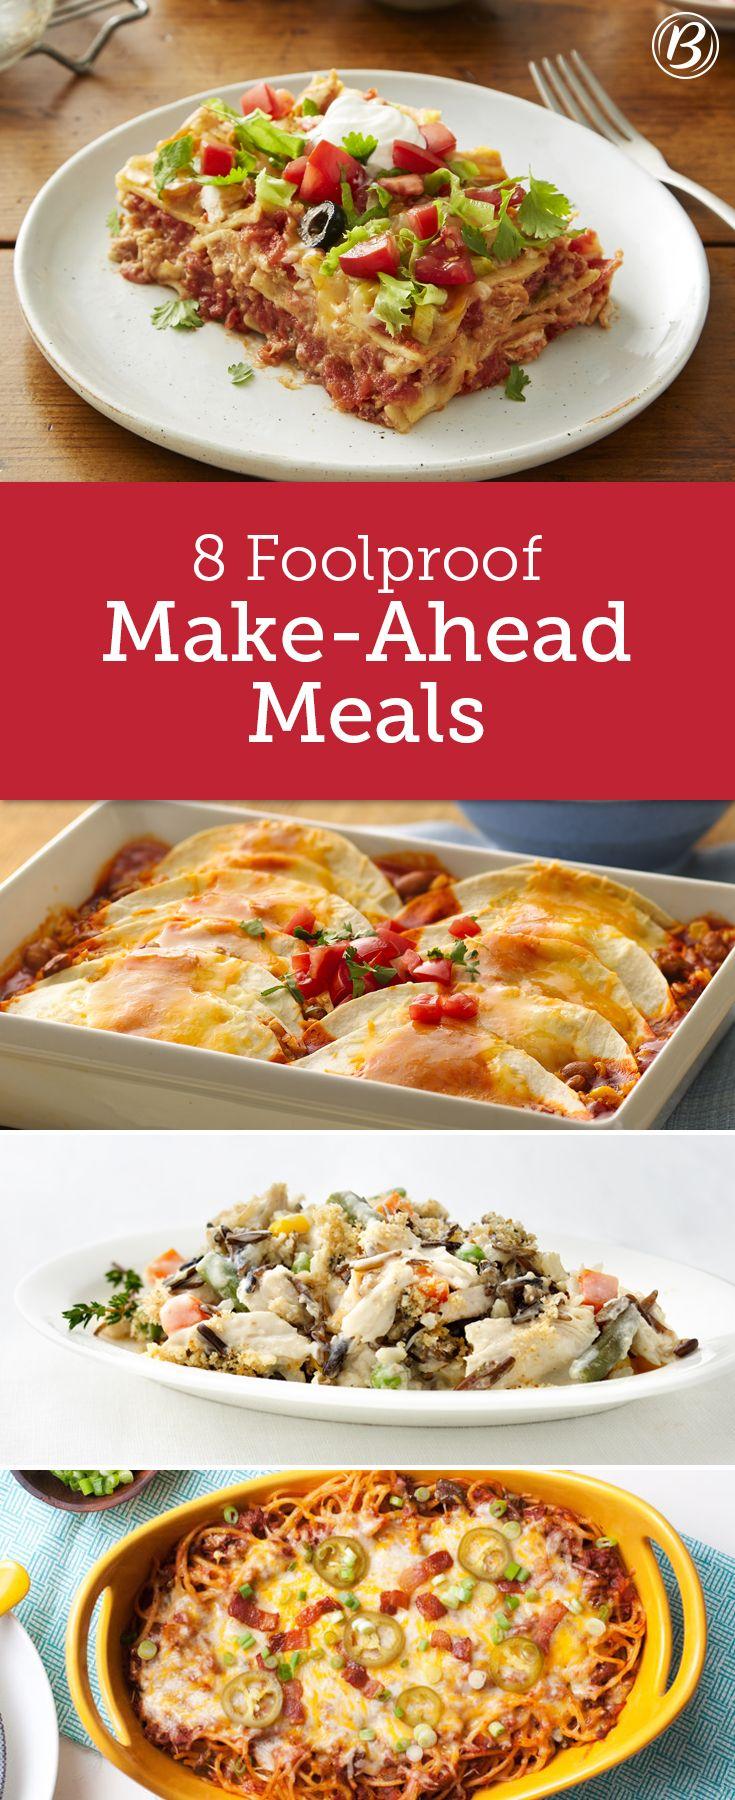 Freezer Meals You Can Make Ahead Meals Make Ahead Meals Food